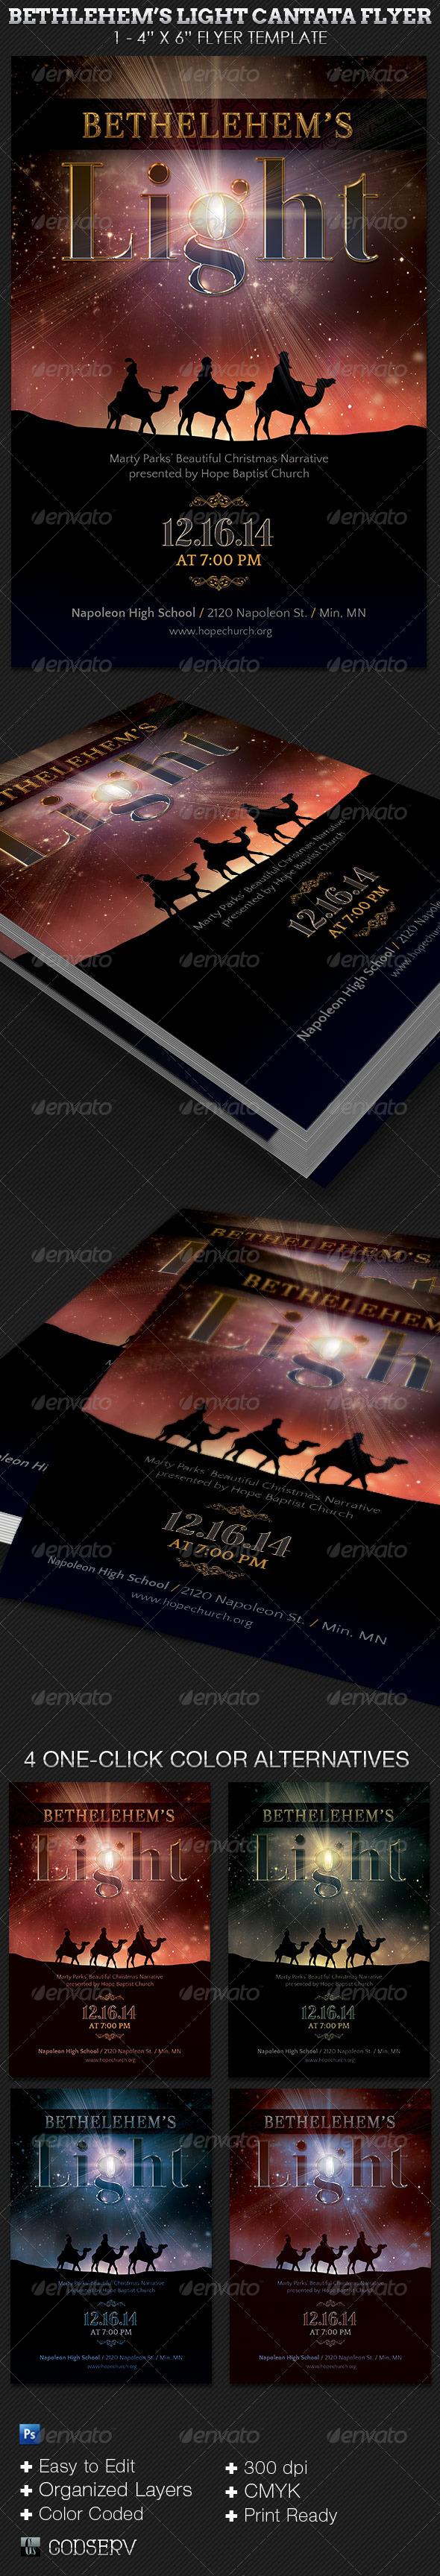 Bethlehem Light Cantata Flyer Template - Church Flyers